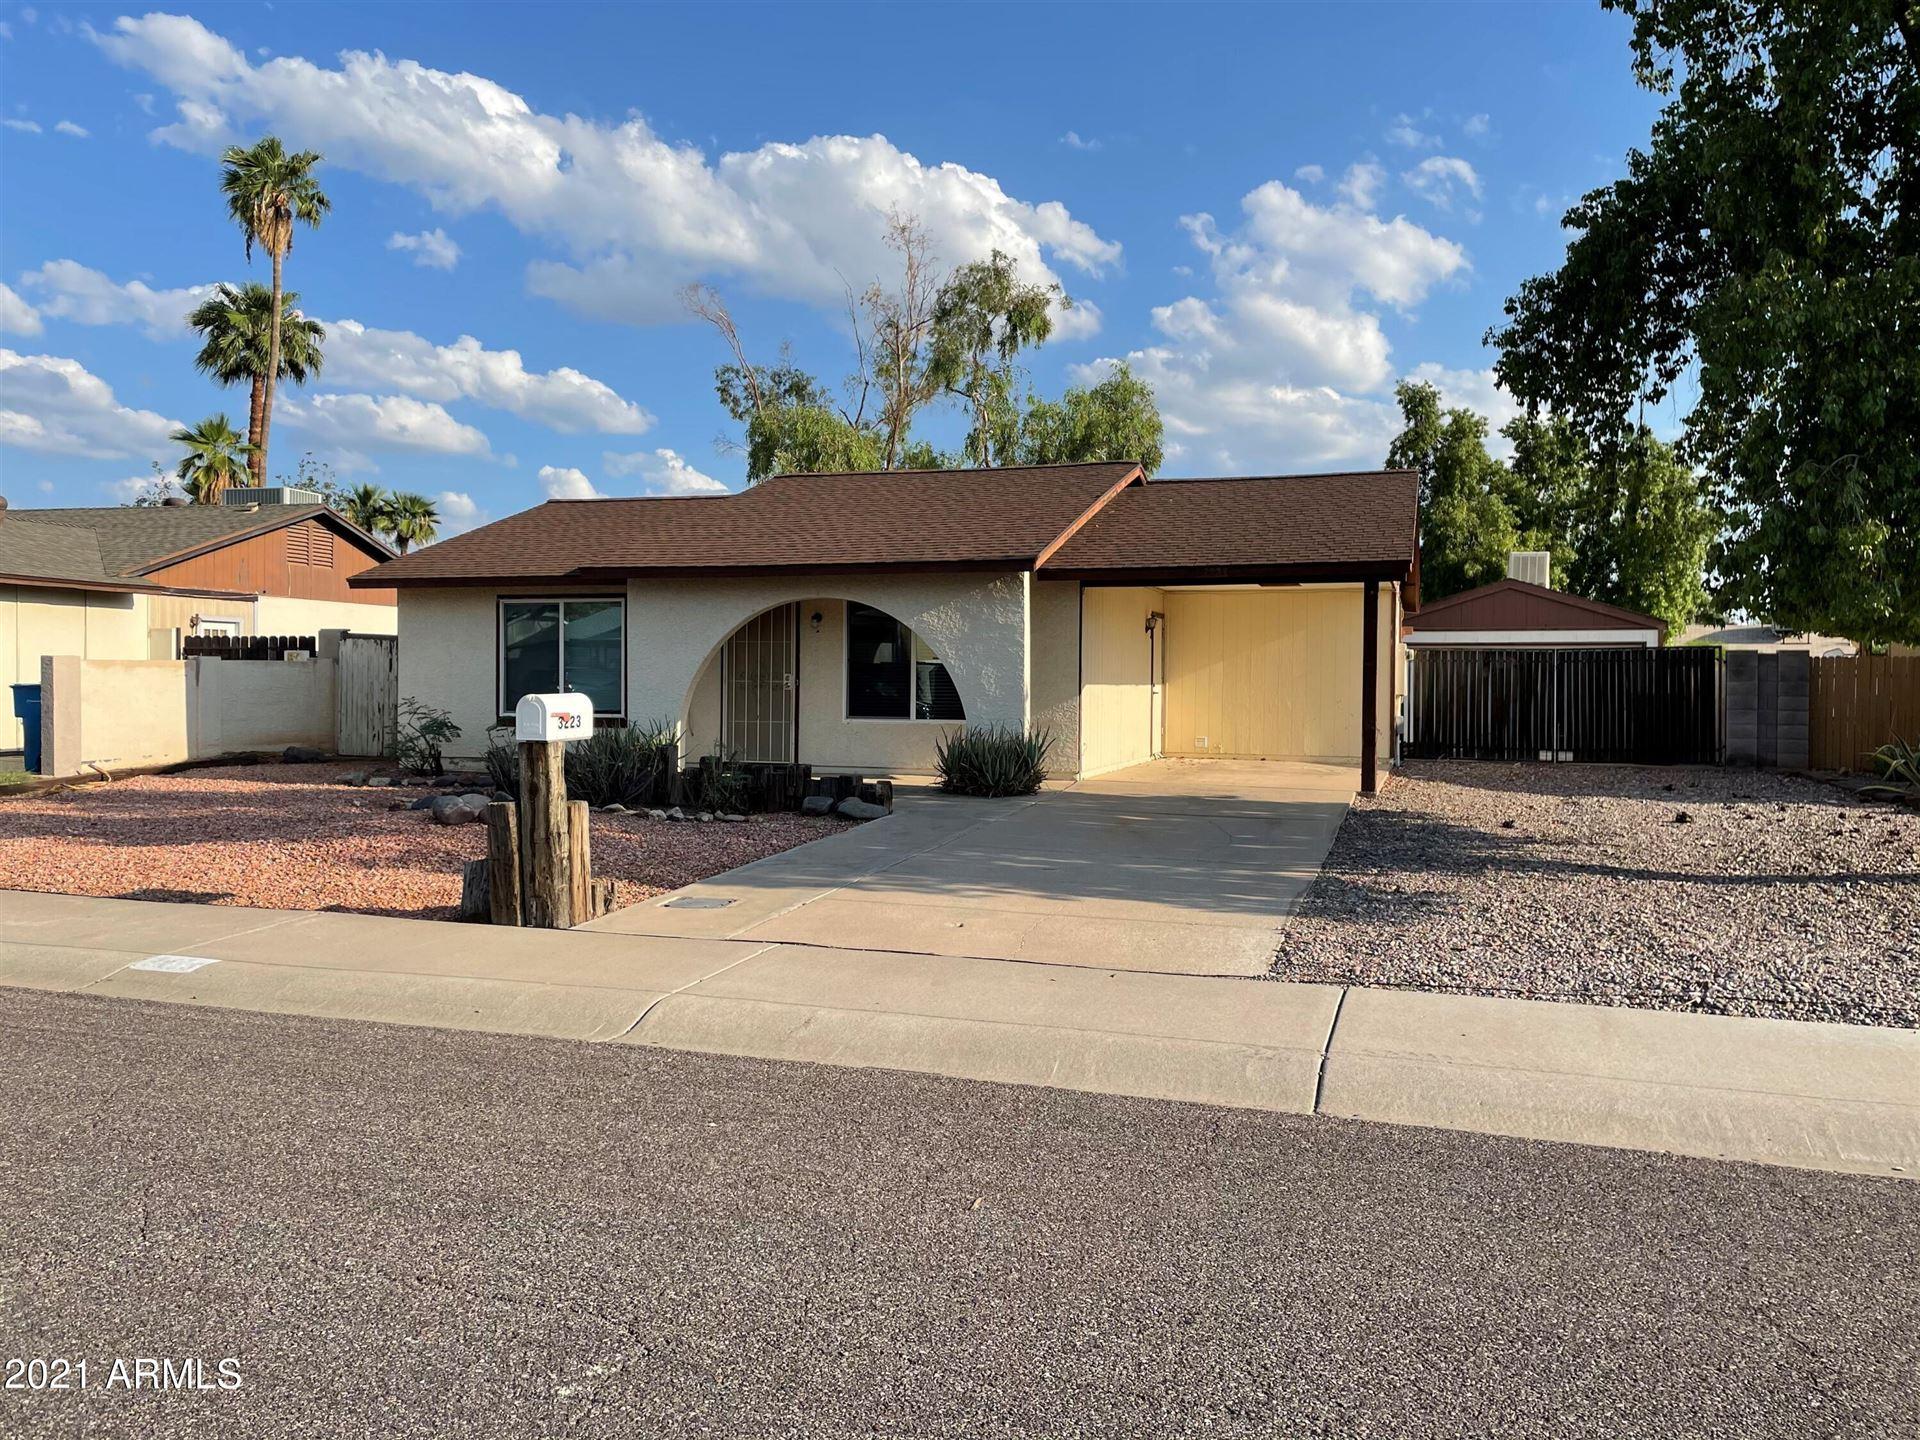 3223 E ANGELA Drive, Phoenix, AZ 85032 - MLS#: 6287274